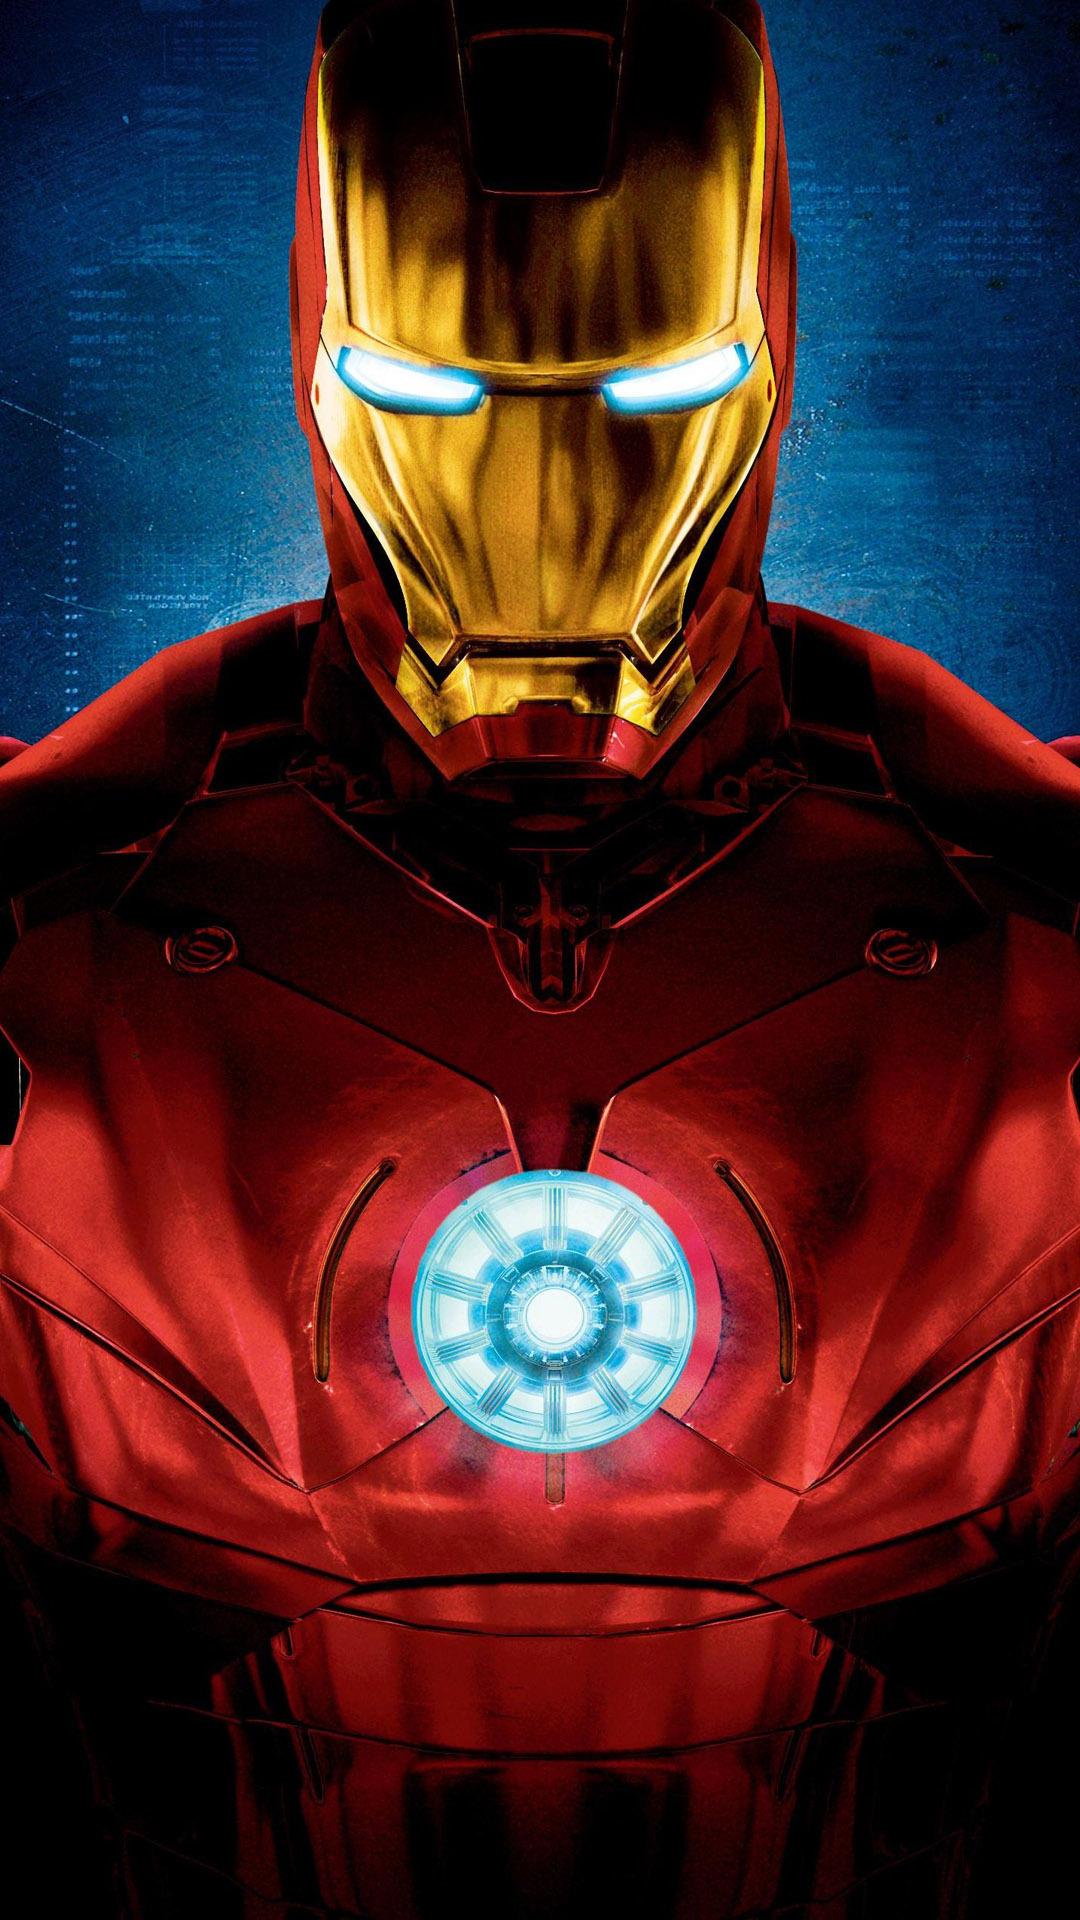 50+] Iron Man Wallpaper iPhone on